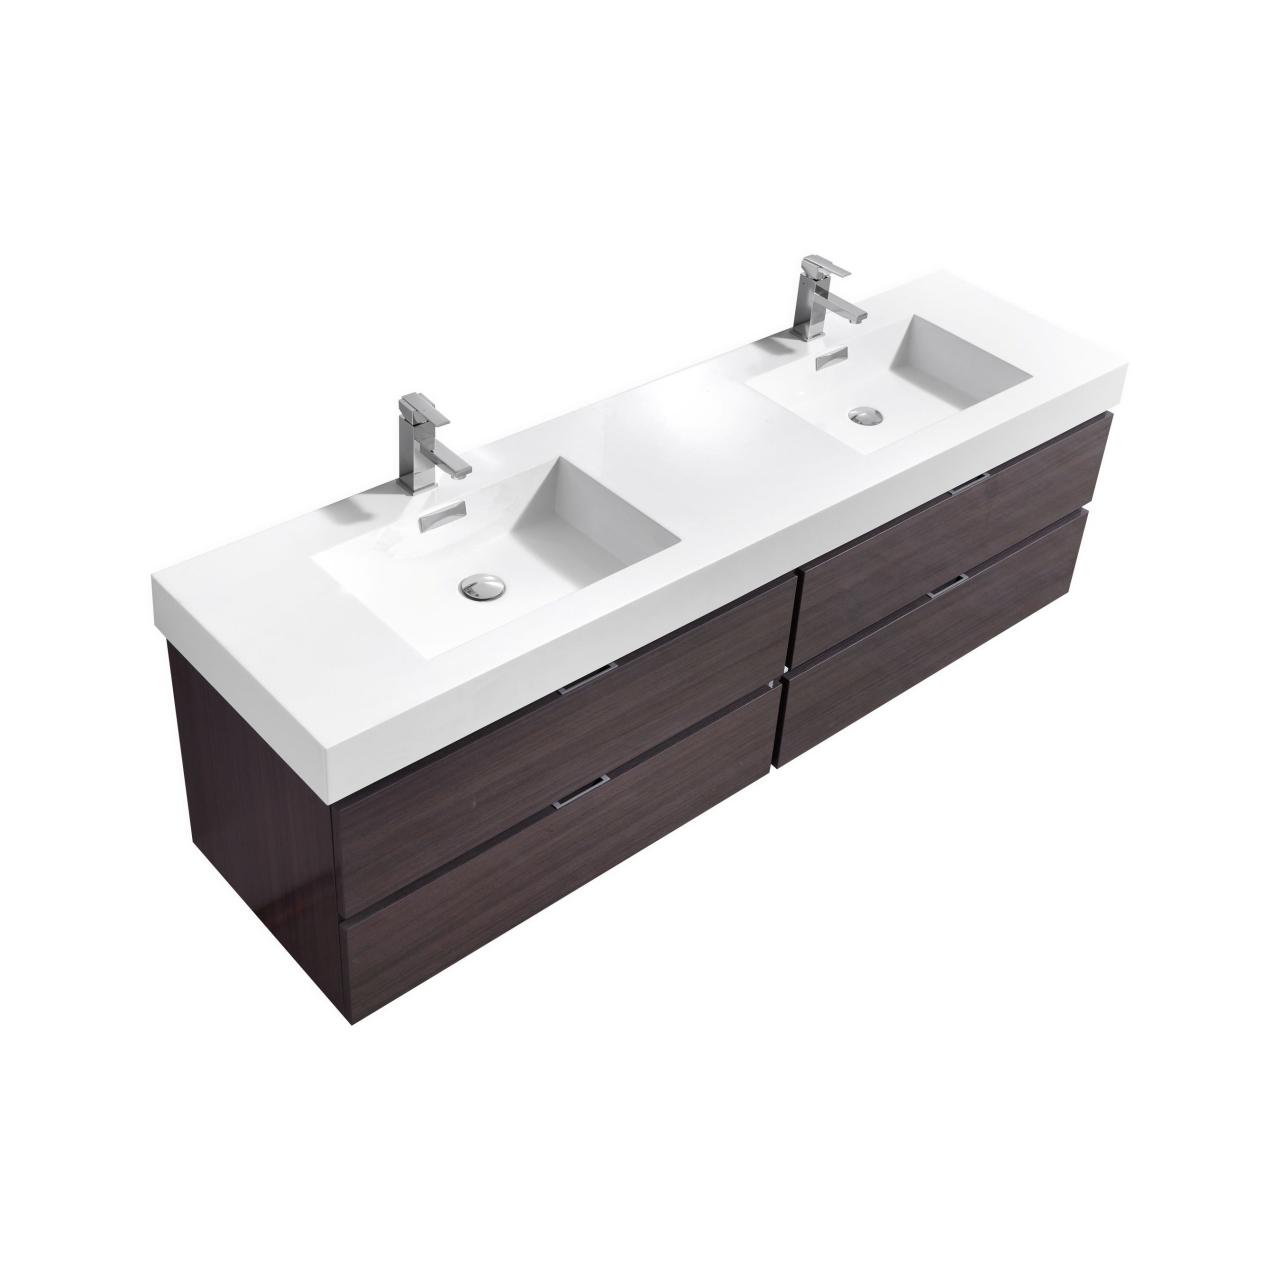 Bliss 80 Quot High Gloss Gray Oak Wall Mount Double Sink Vanity